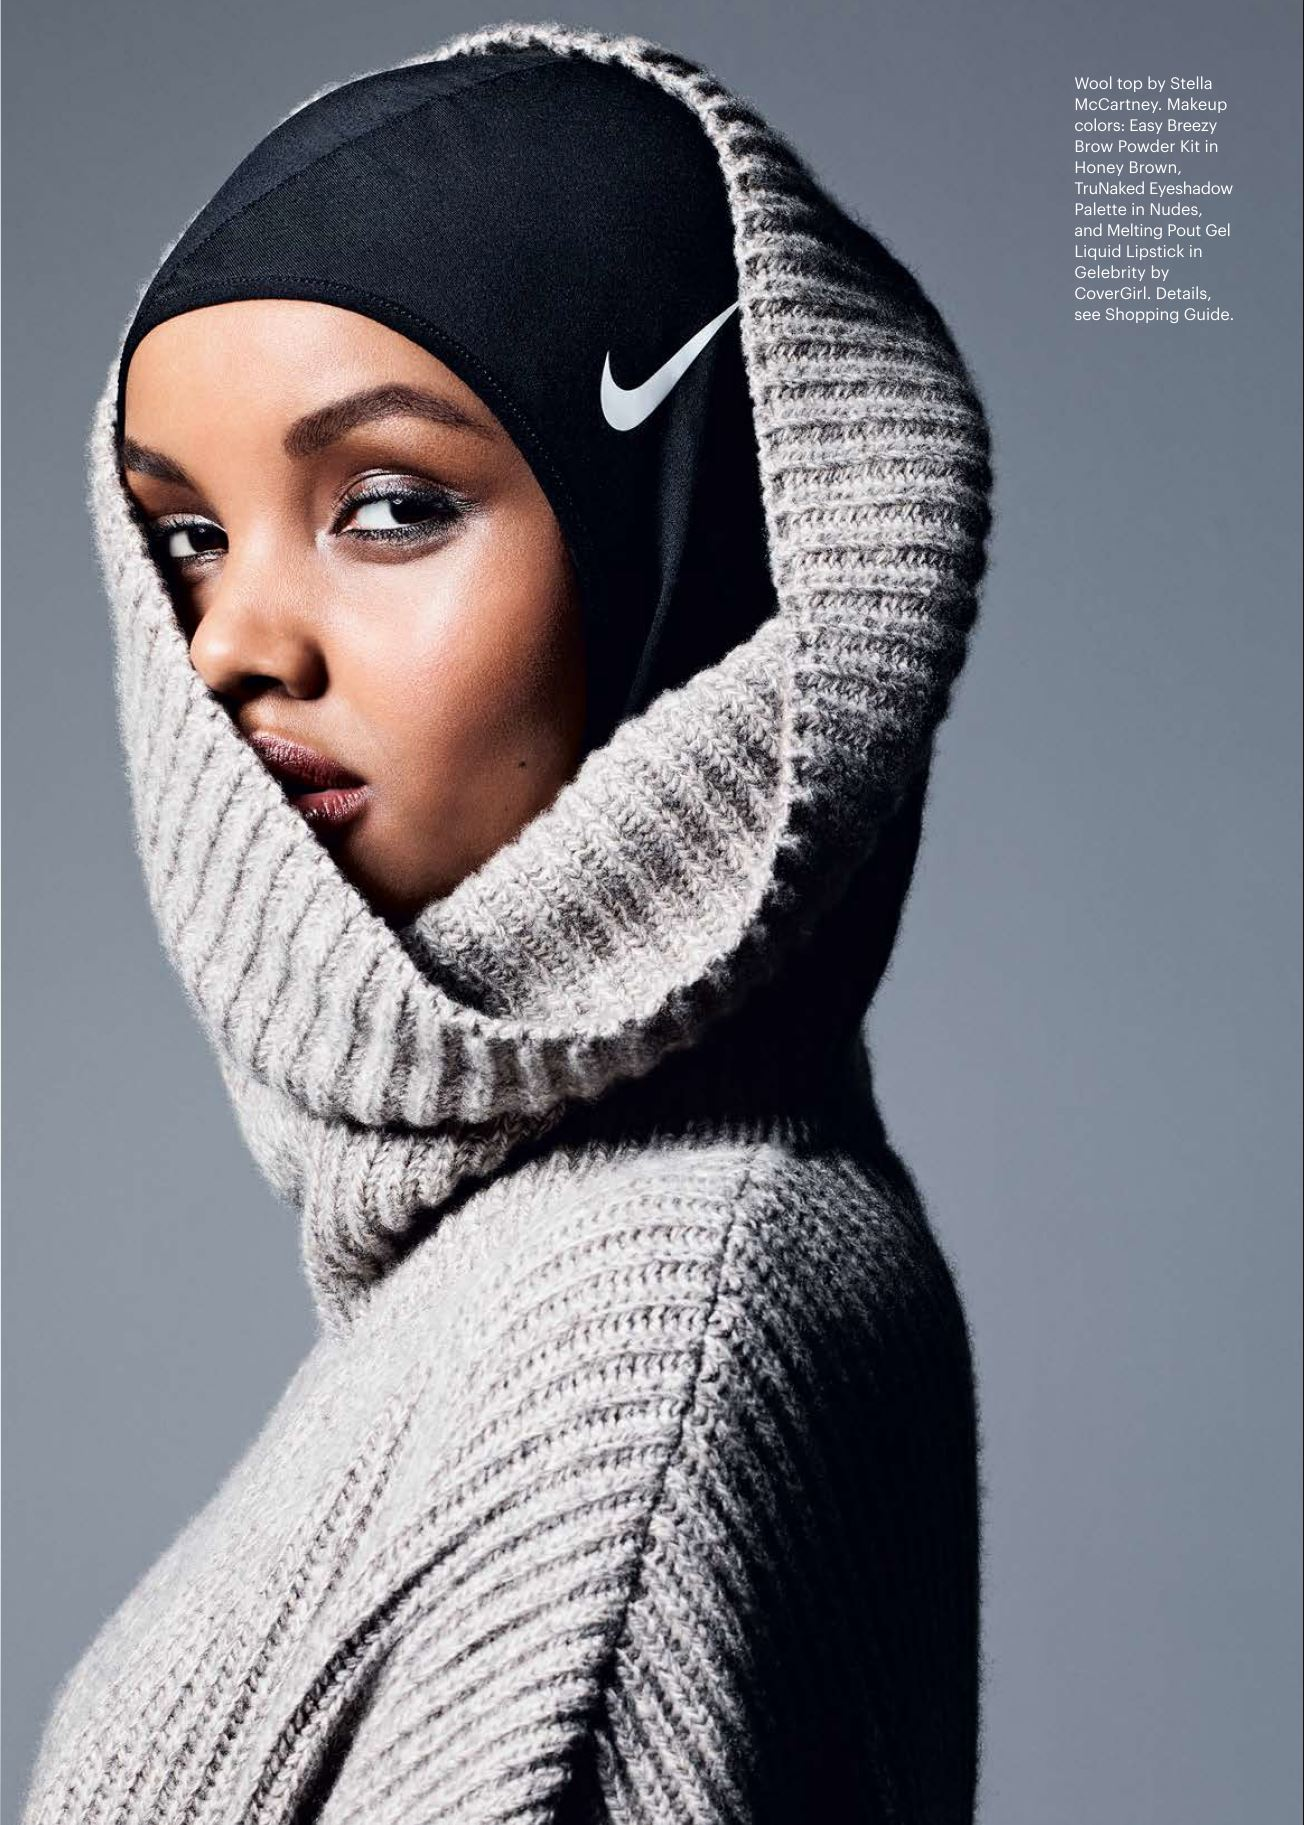 Montgomery marido La base de datos  Nike Pro Hijab   Nano Frdws